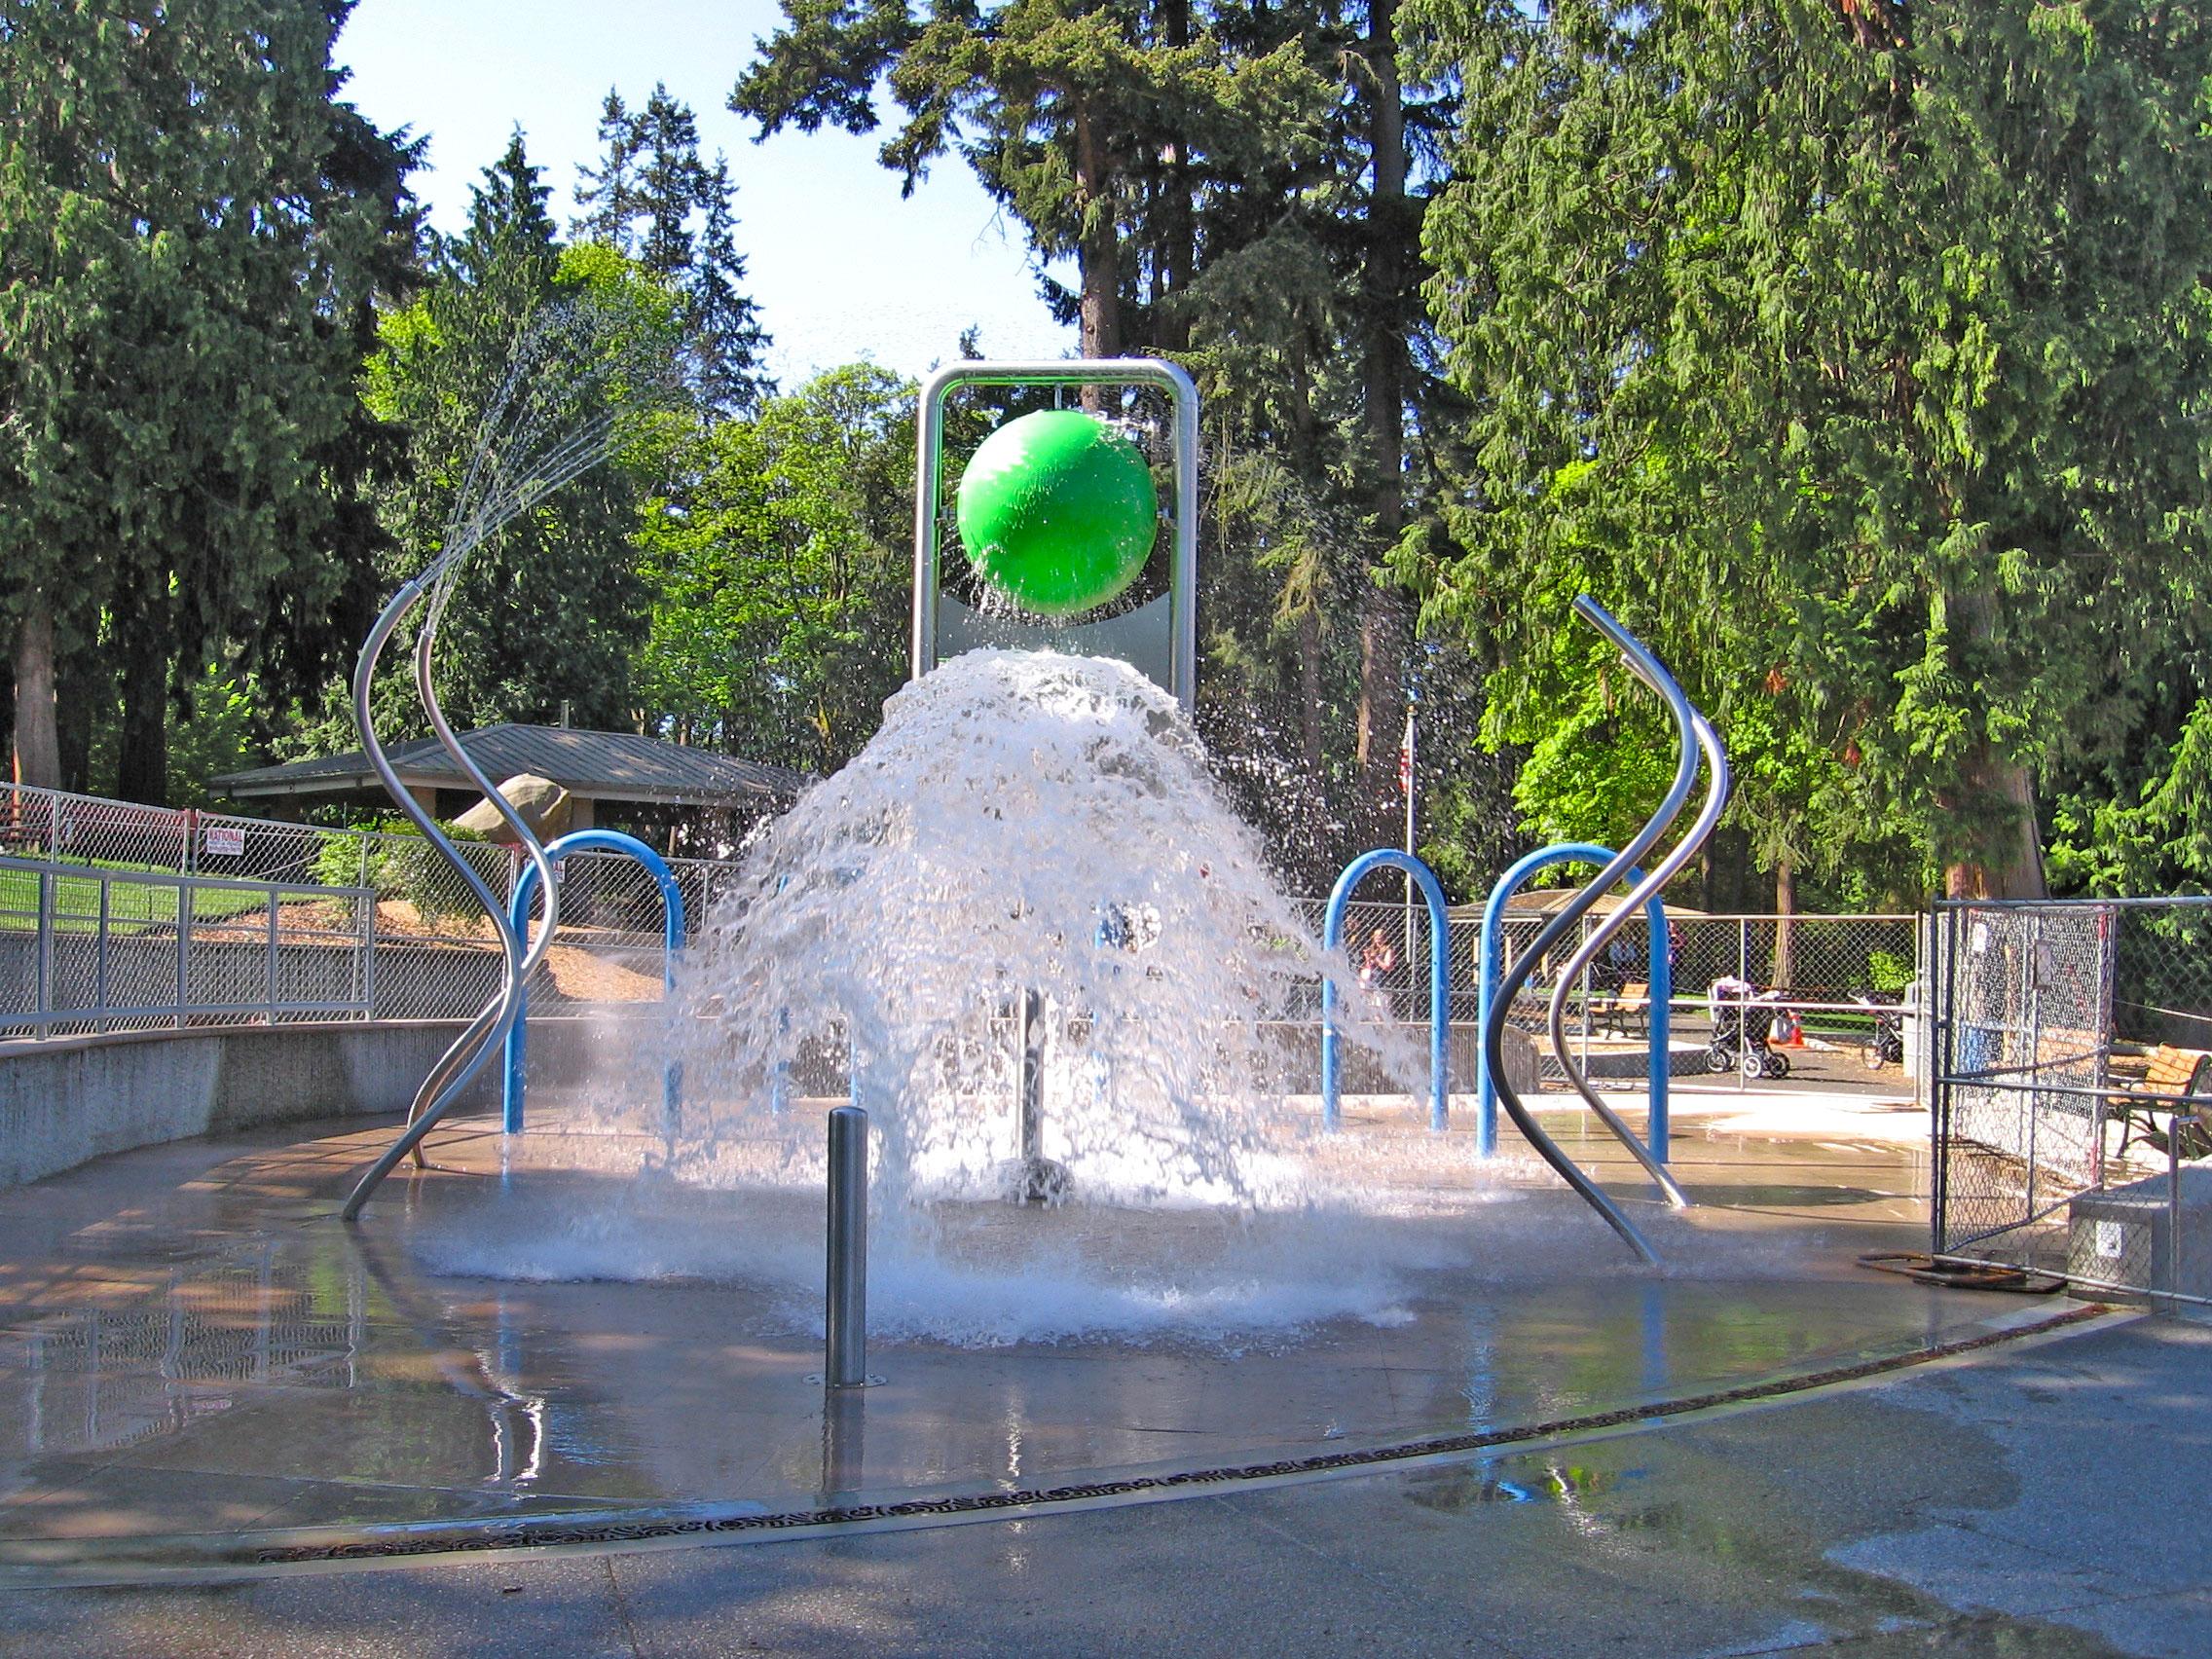 Hazel Miller Spray Park Opening Seattle Area Family Fun